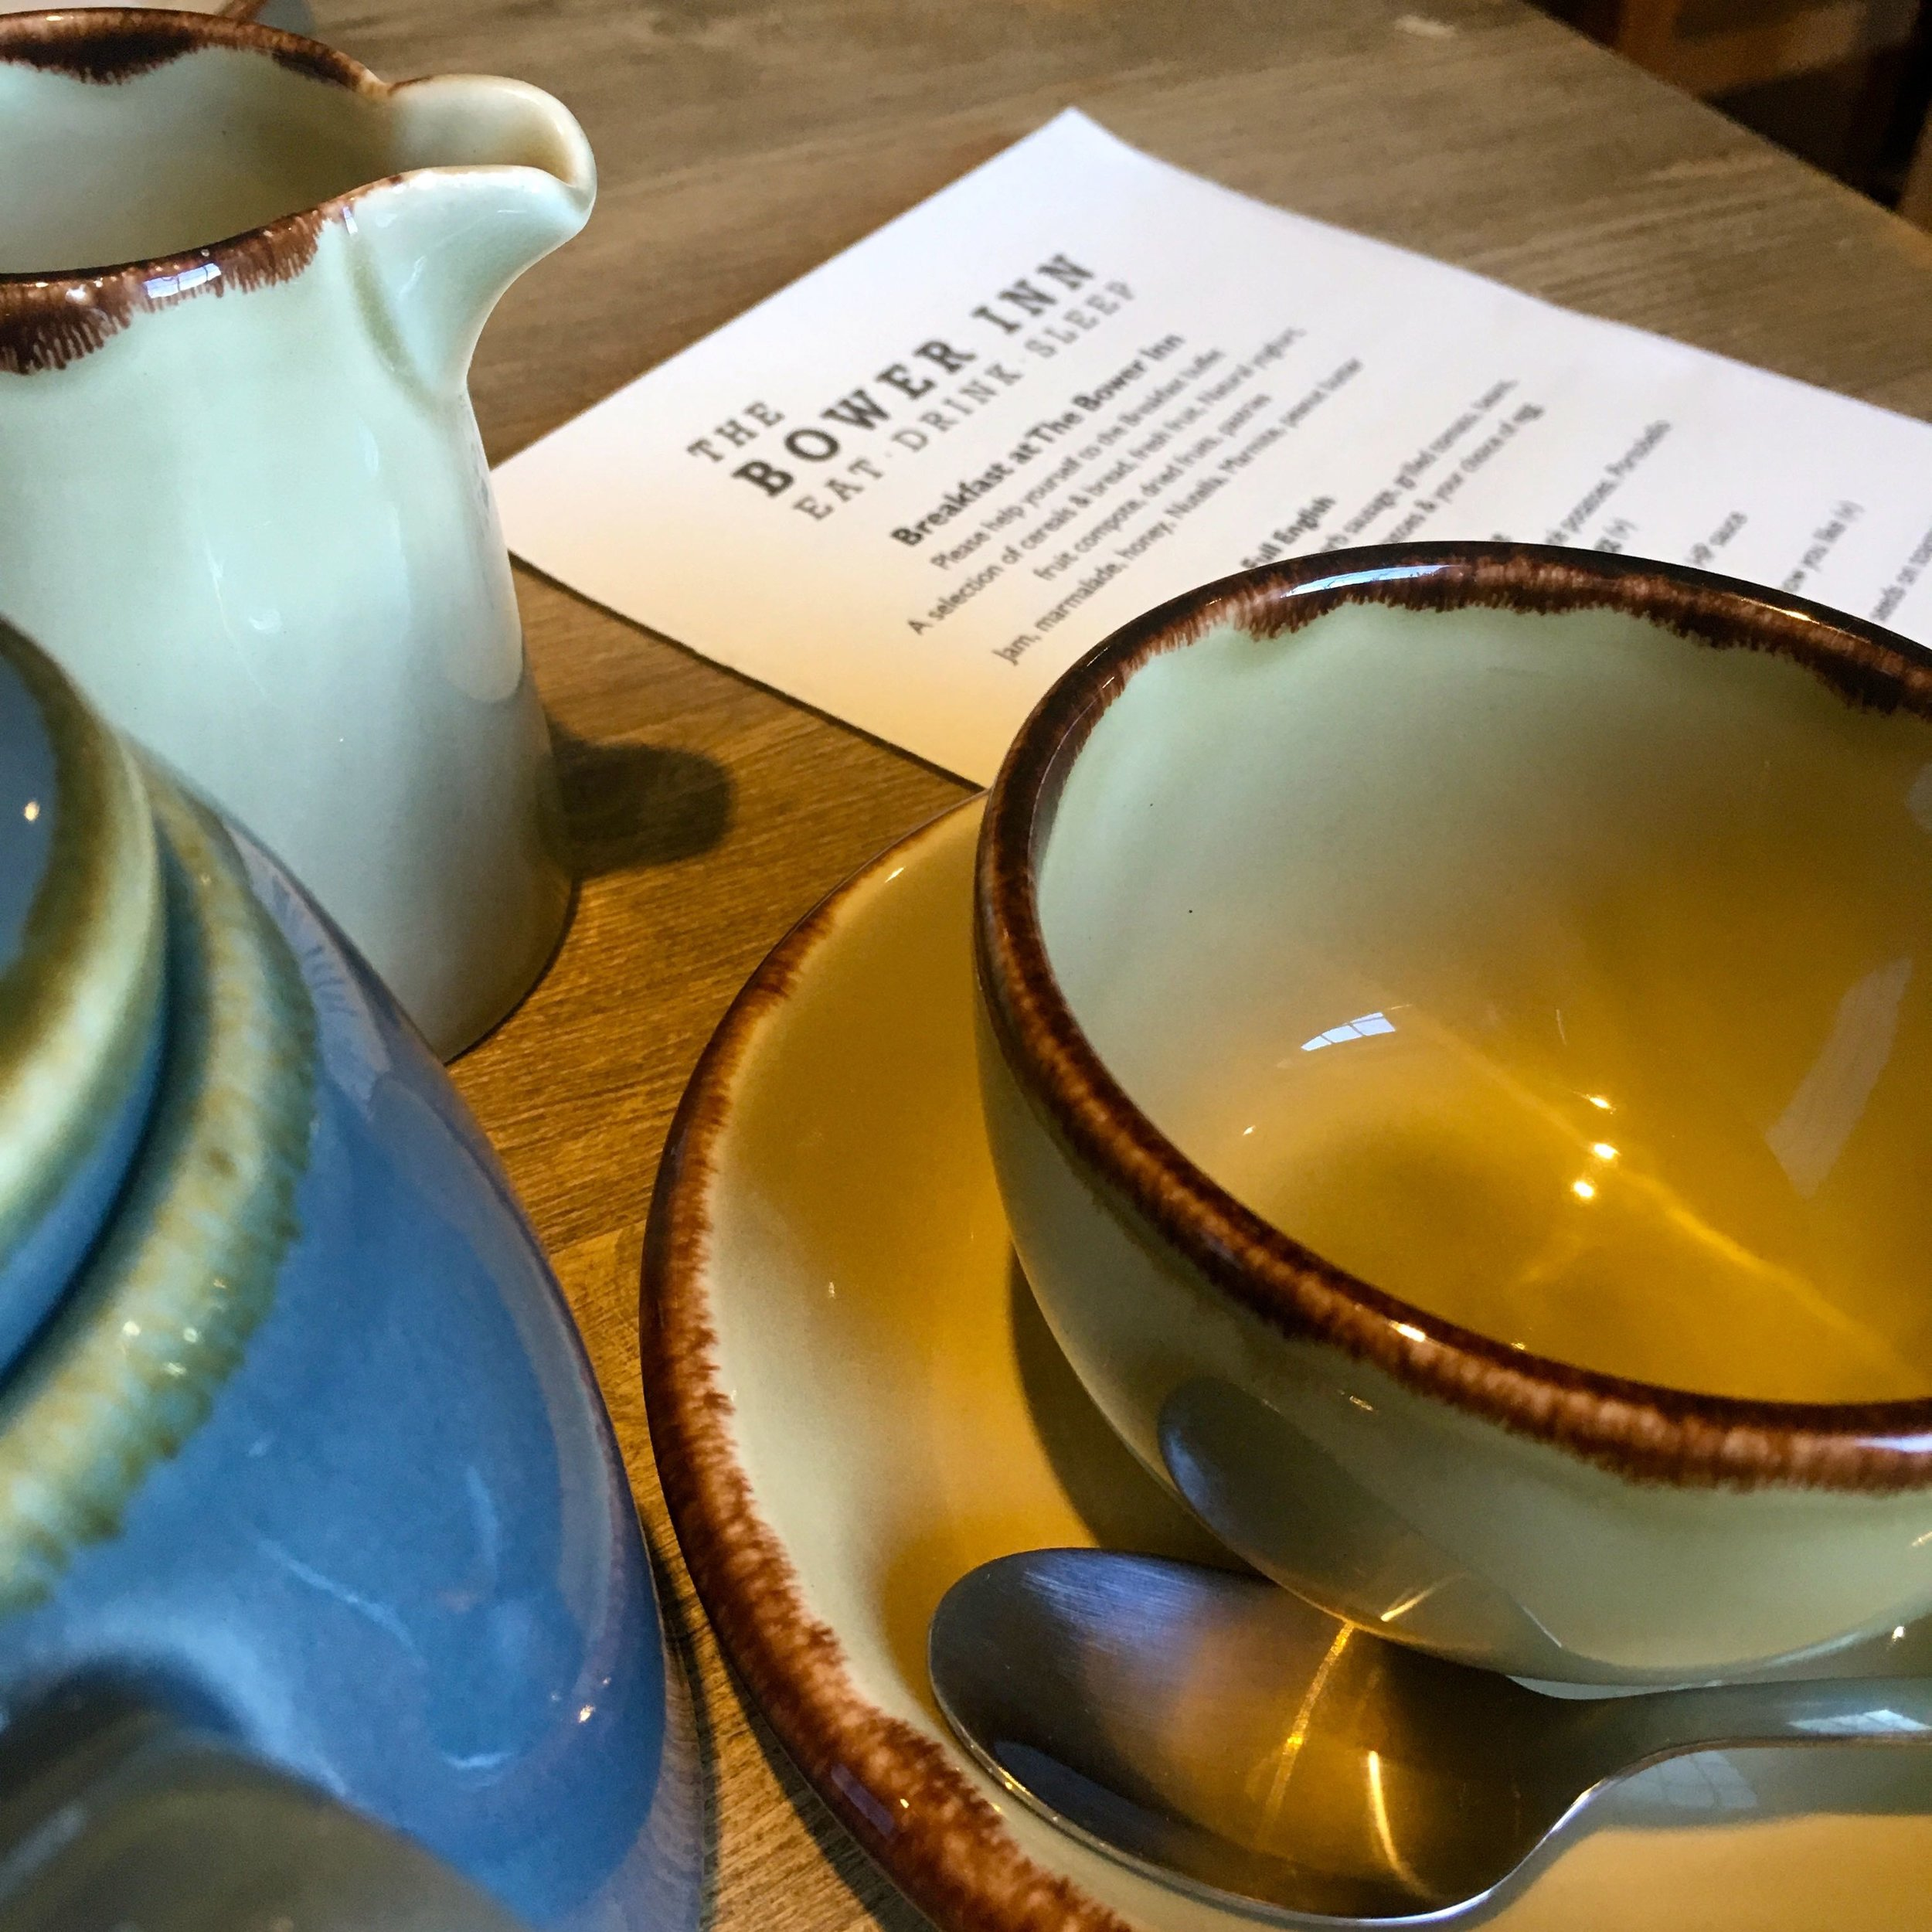 Breakfast at the Bower Inn in Bridgwater